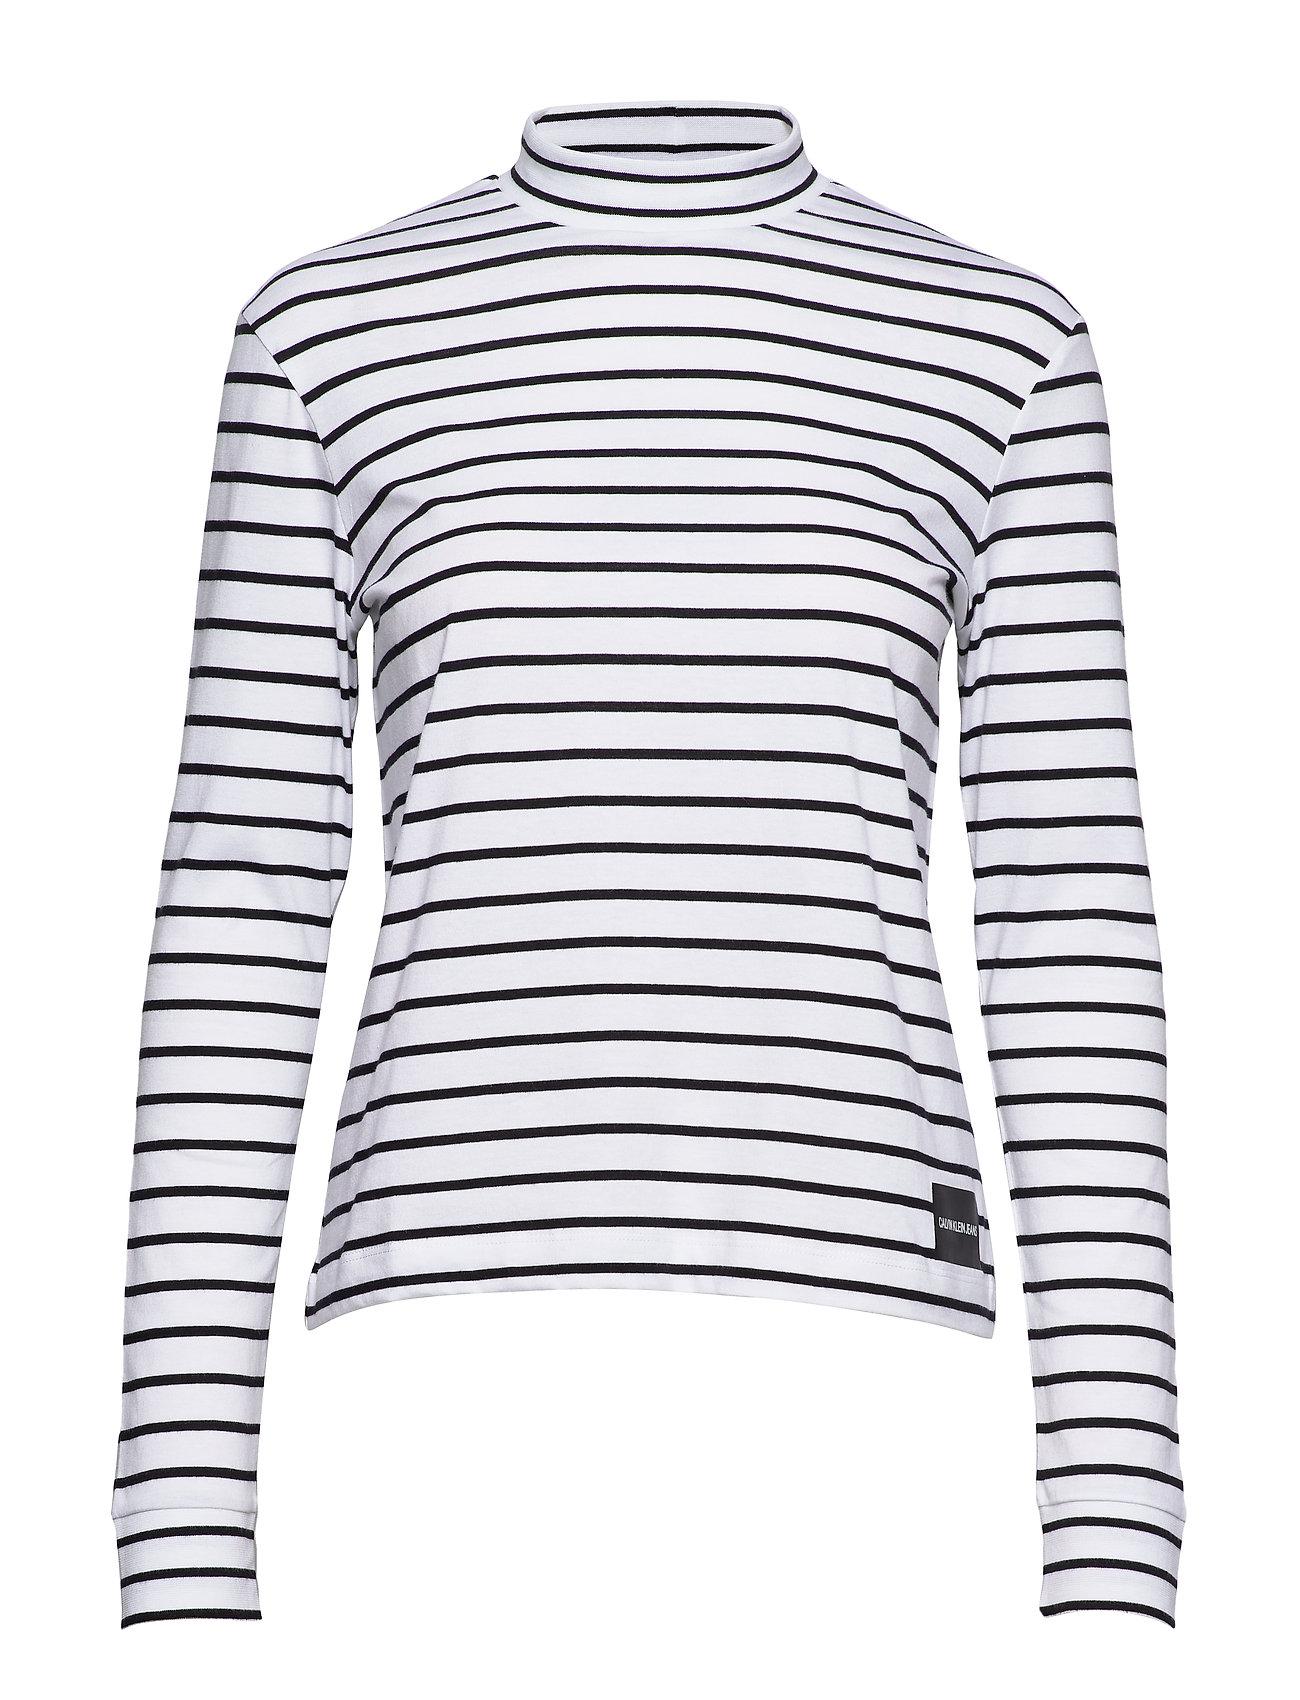 Calvin Klein Jeans MOCK NECK LS TEE, 90 - WHITE/CK BLACK STRIPES